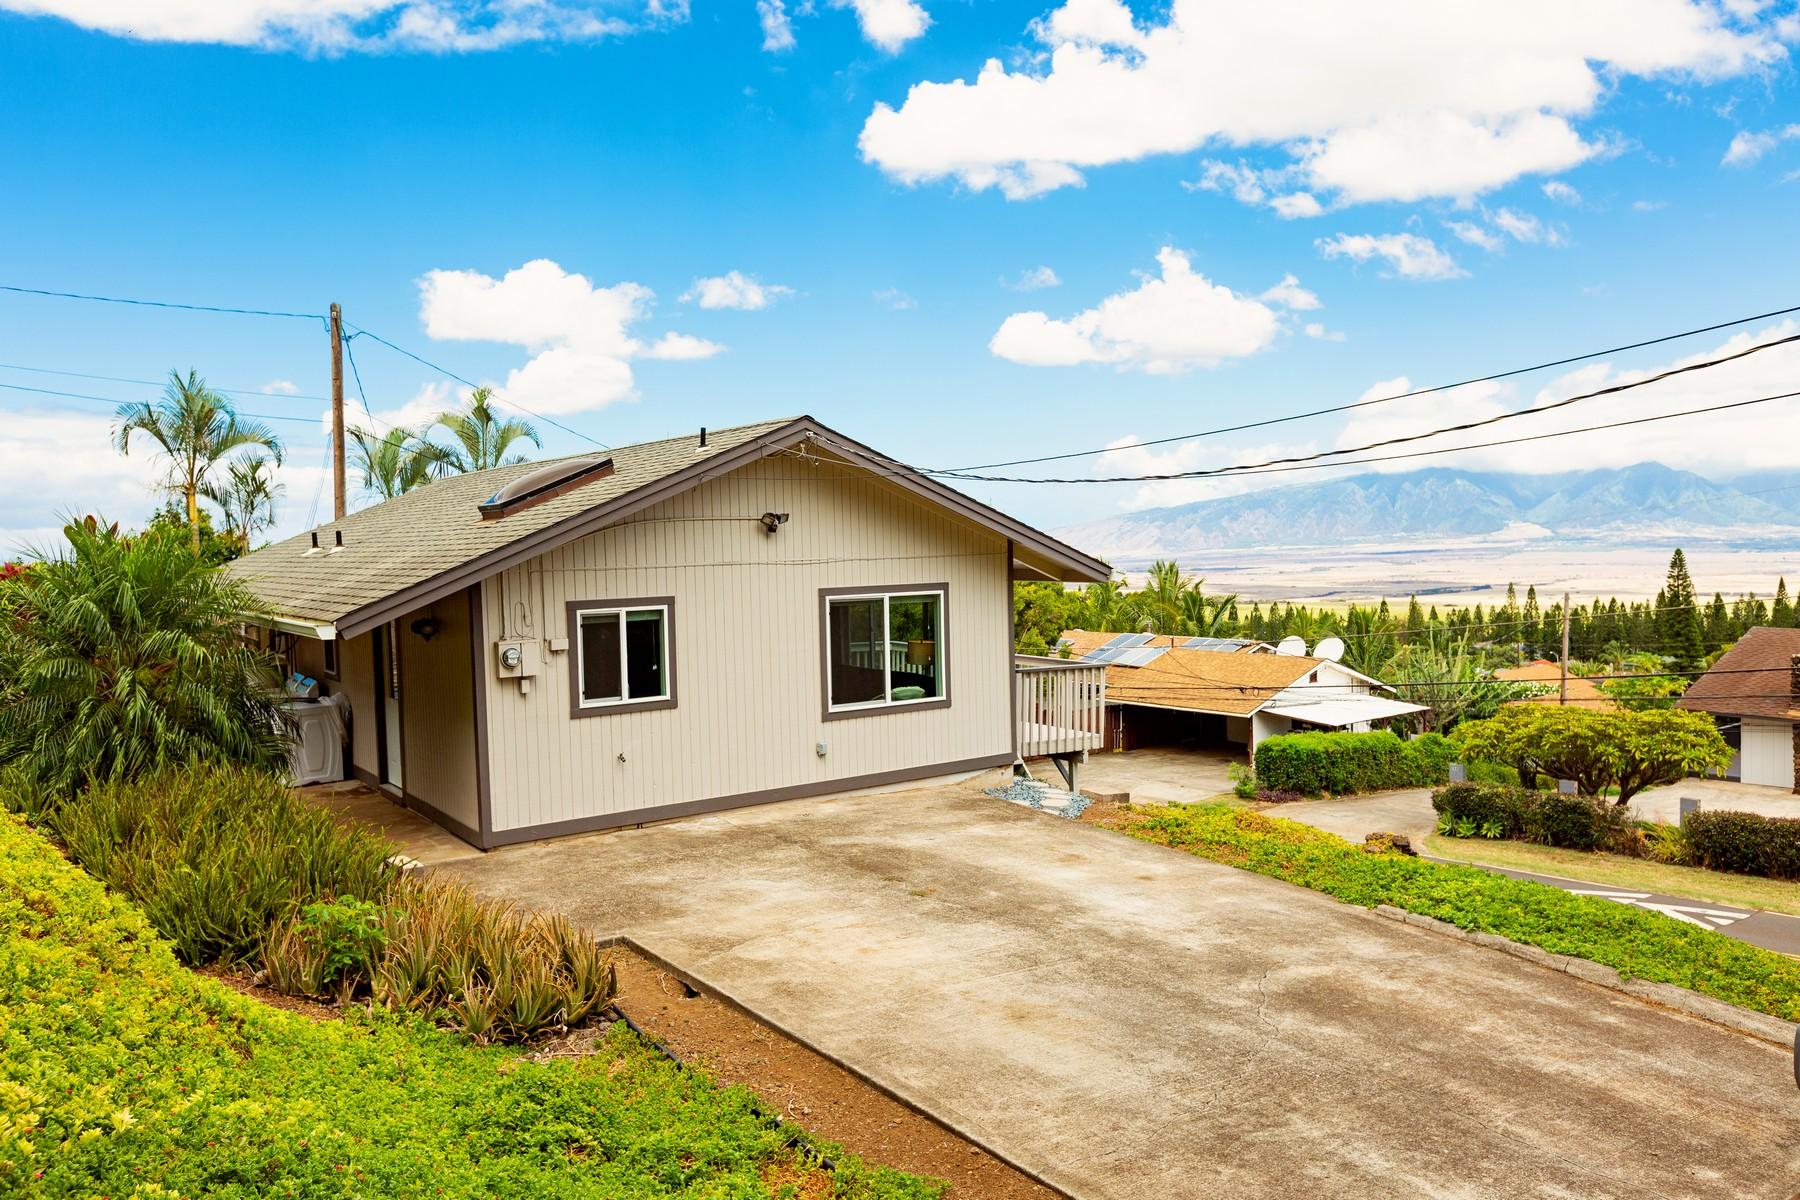 Single Family Homes για την Πώληση στο Pukalani Cottage 187 Haulani St, #B, Pukalani, Χαβαη 96768 Ηνωμένες Πολιτείες